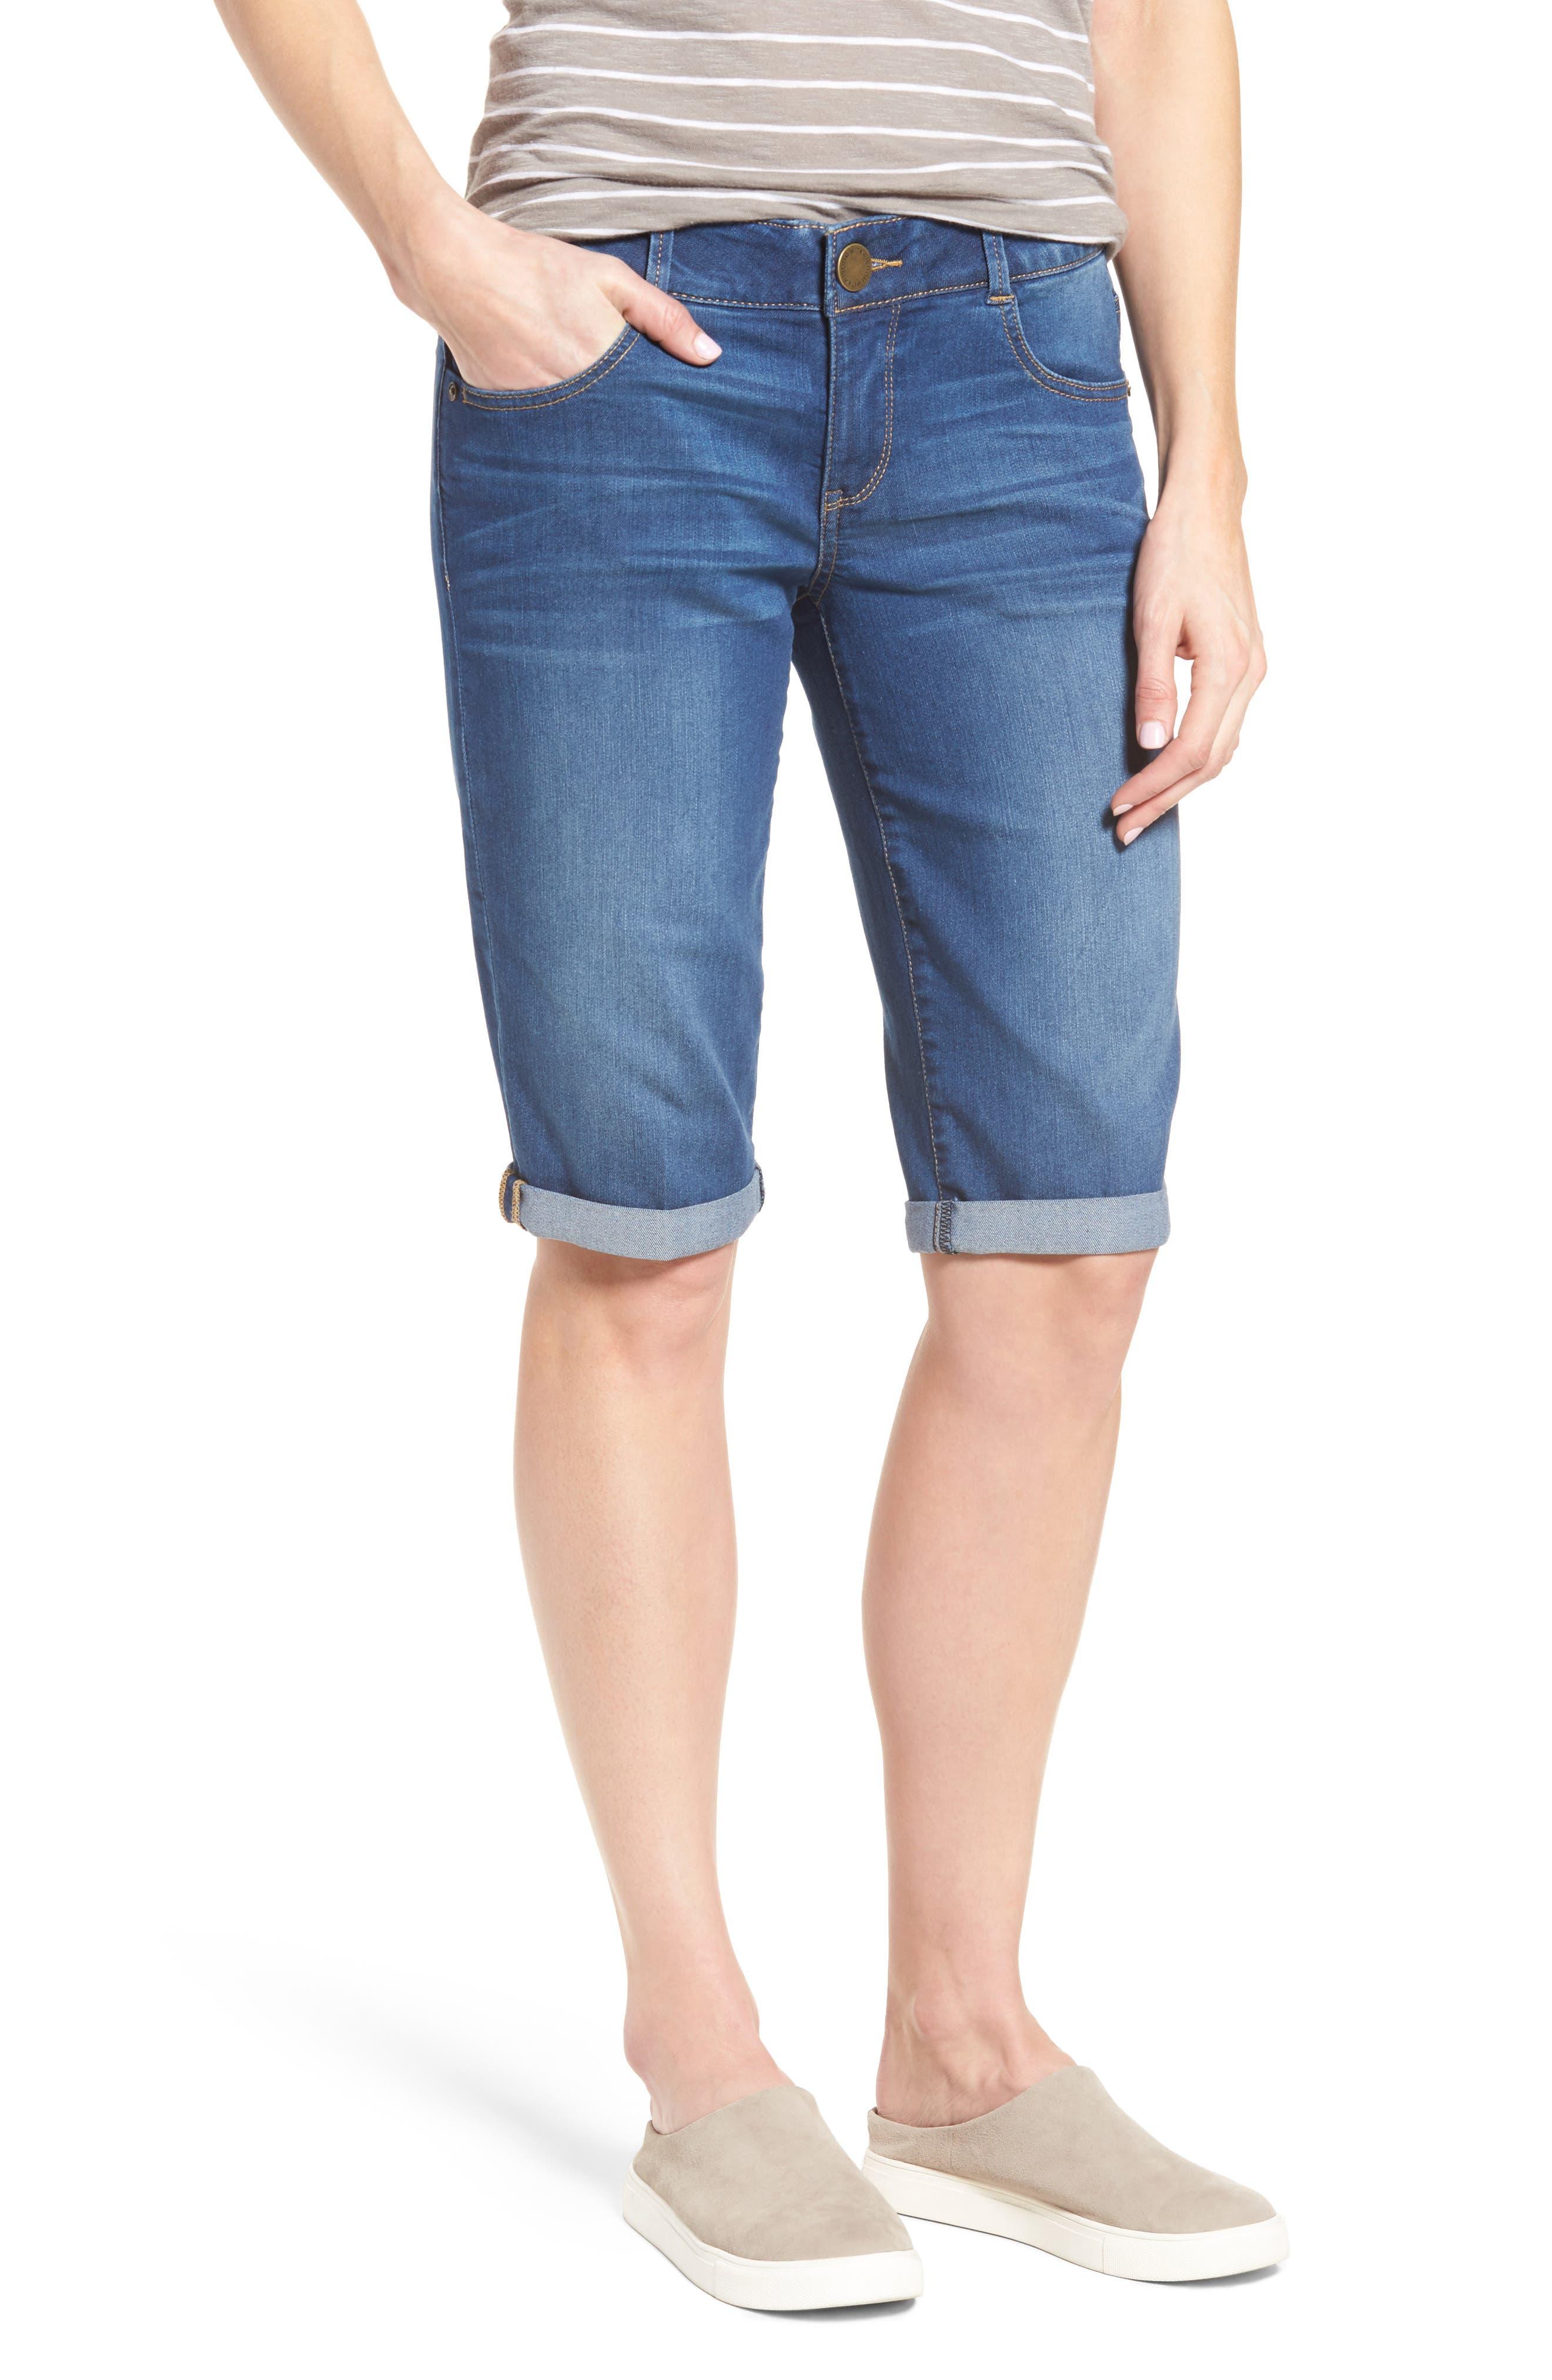 Ab-solution Denim Bermuda Shorts,                         Main,                         color, 420